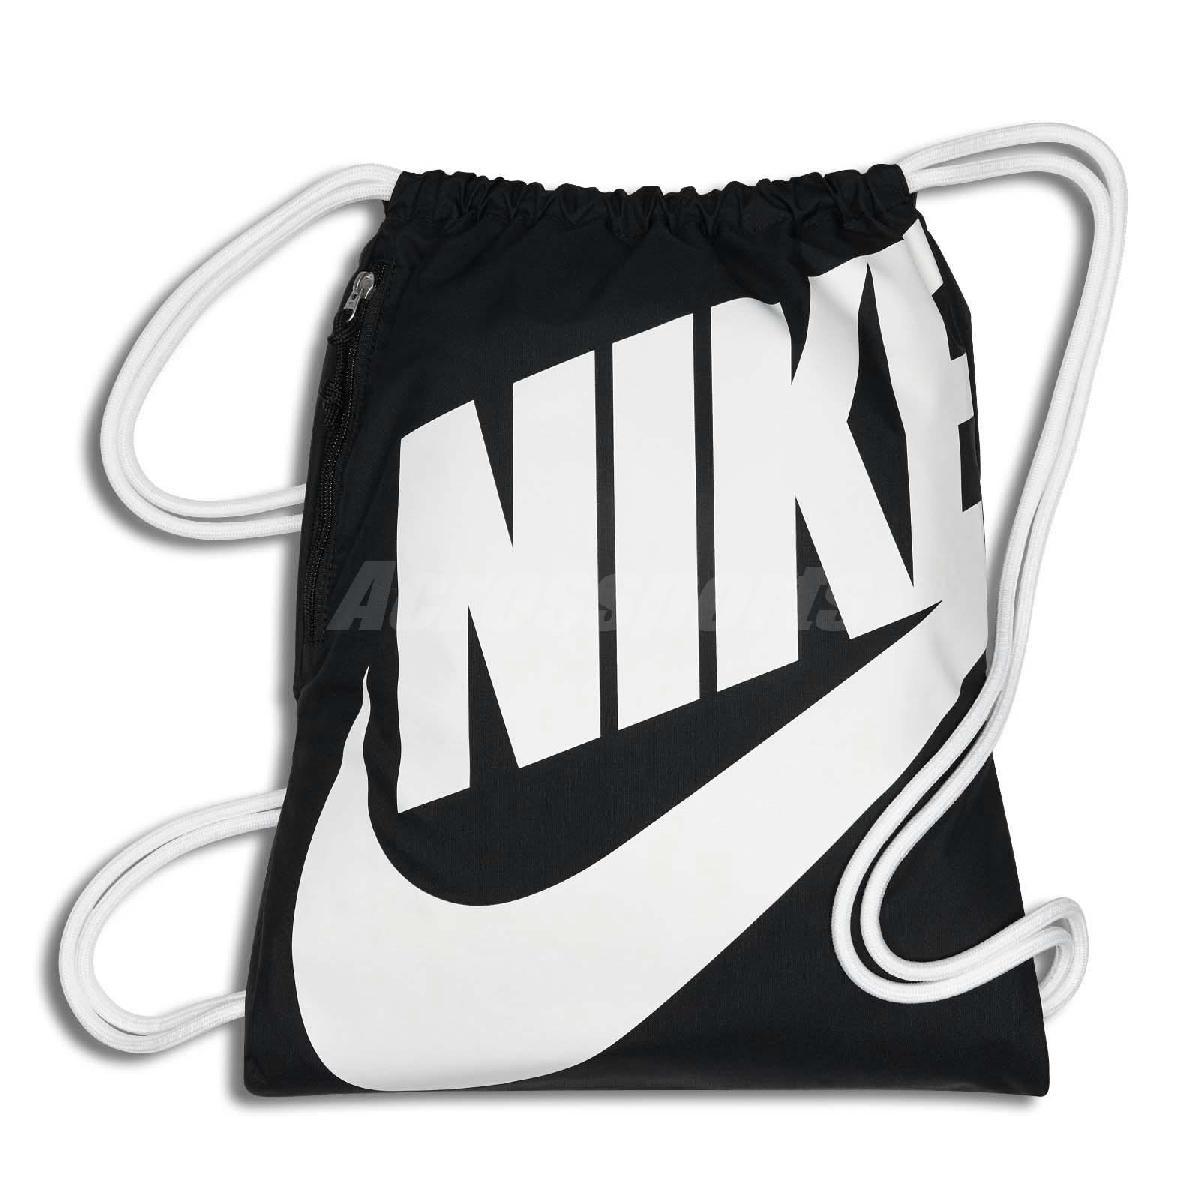 Nike 束口袋 HERITAGE GMSK 黑 白 拉鍊 後背袋 男女款【PUMP306】 BA5351-011